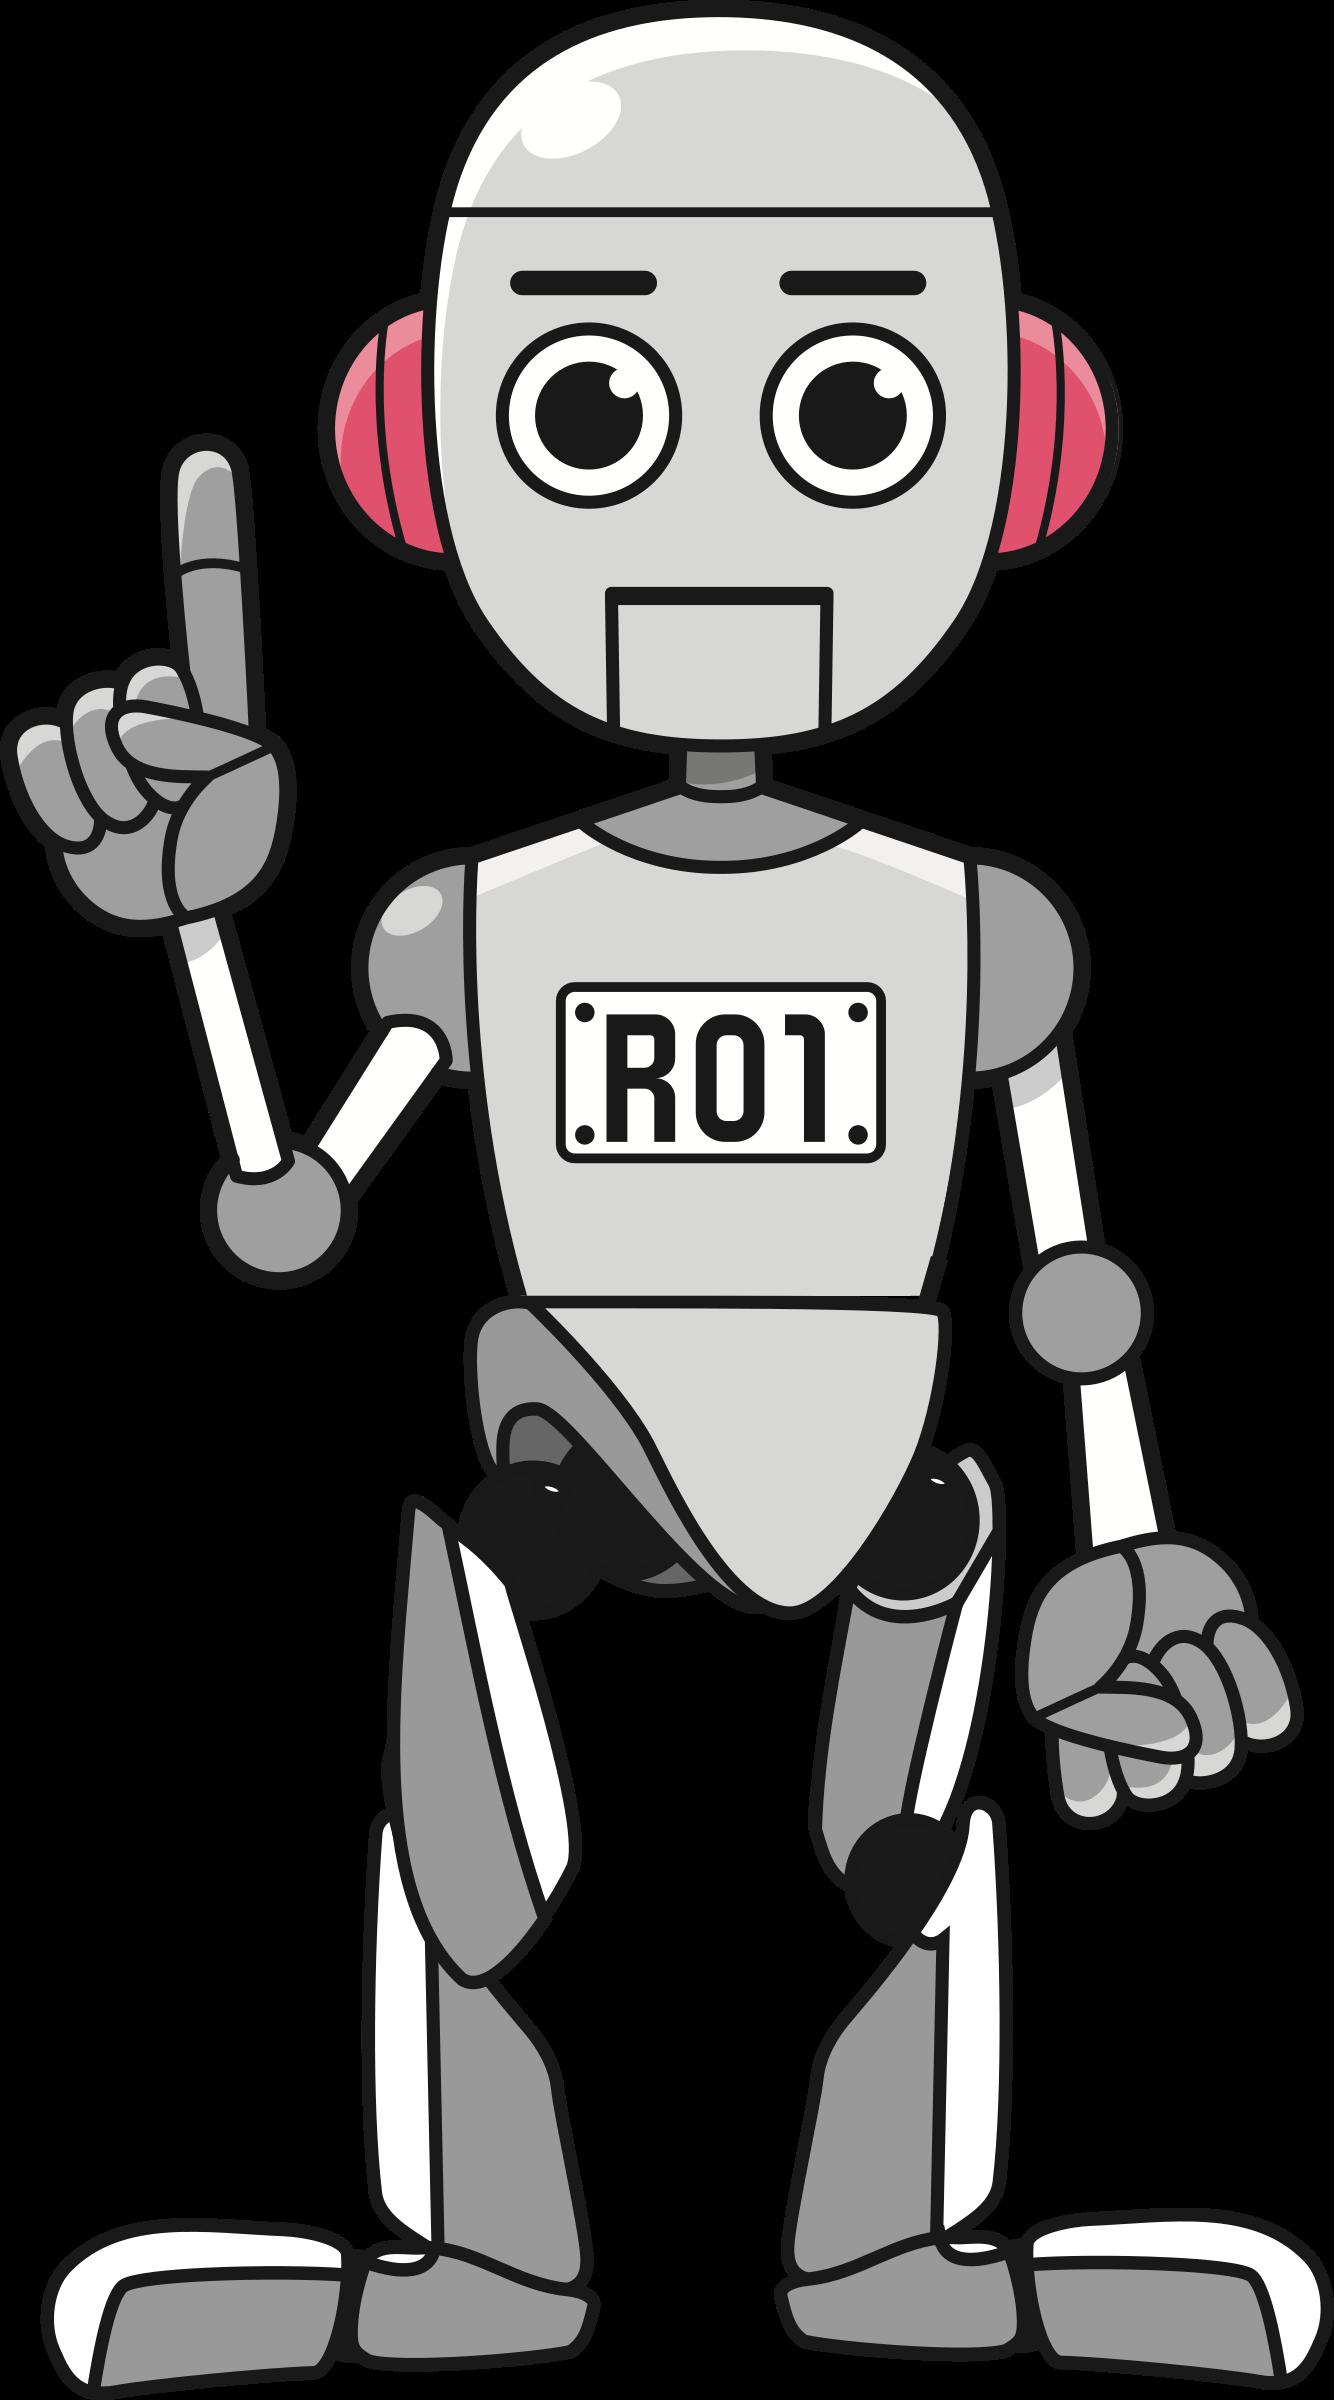 Robot clipart robot body, Robot robot body Transparent FREE.